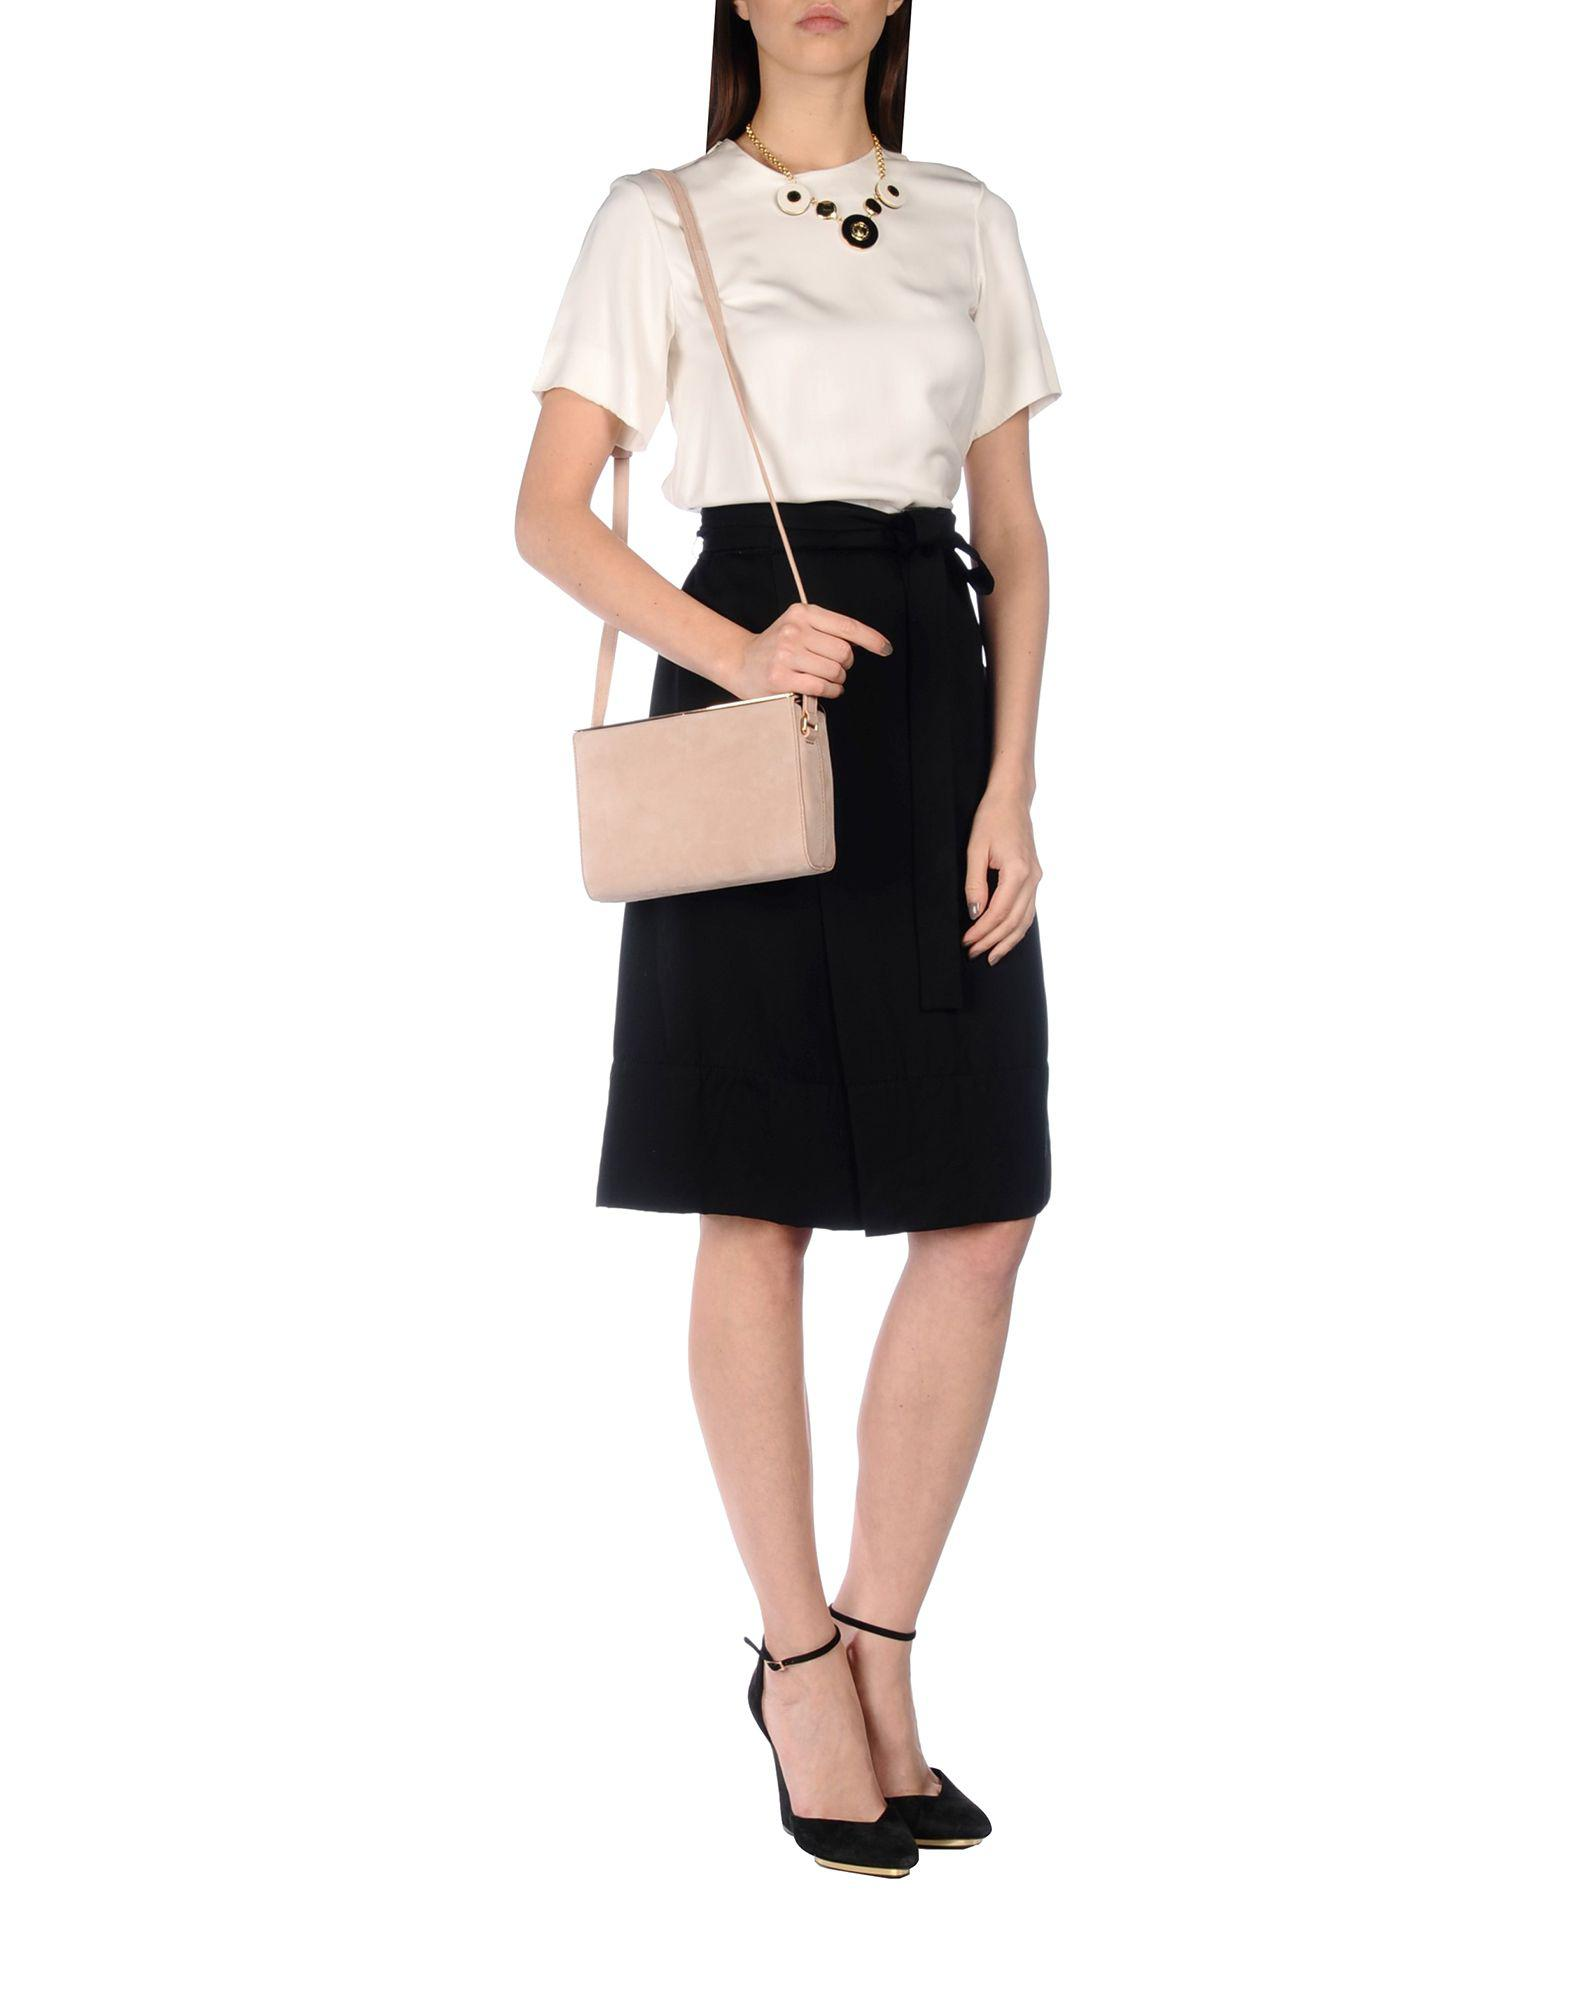 Maison Margiela Leather Cross-body Bag in Pink